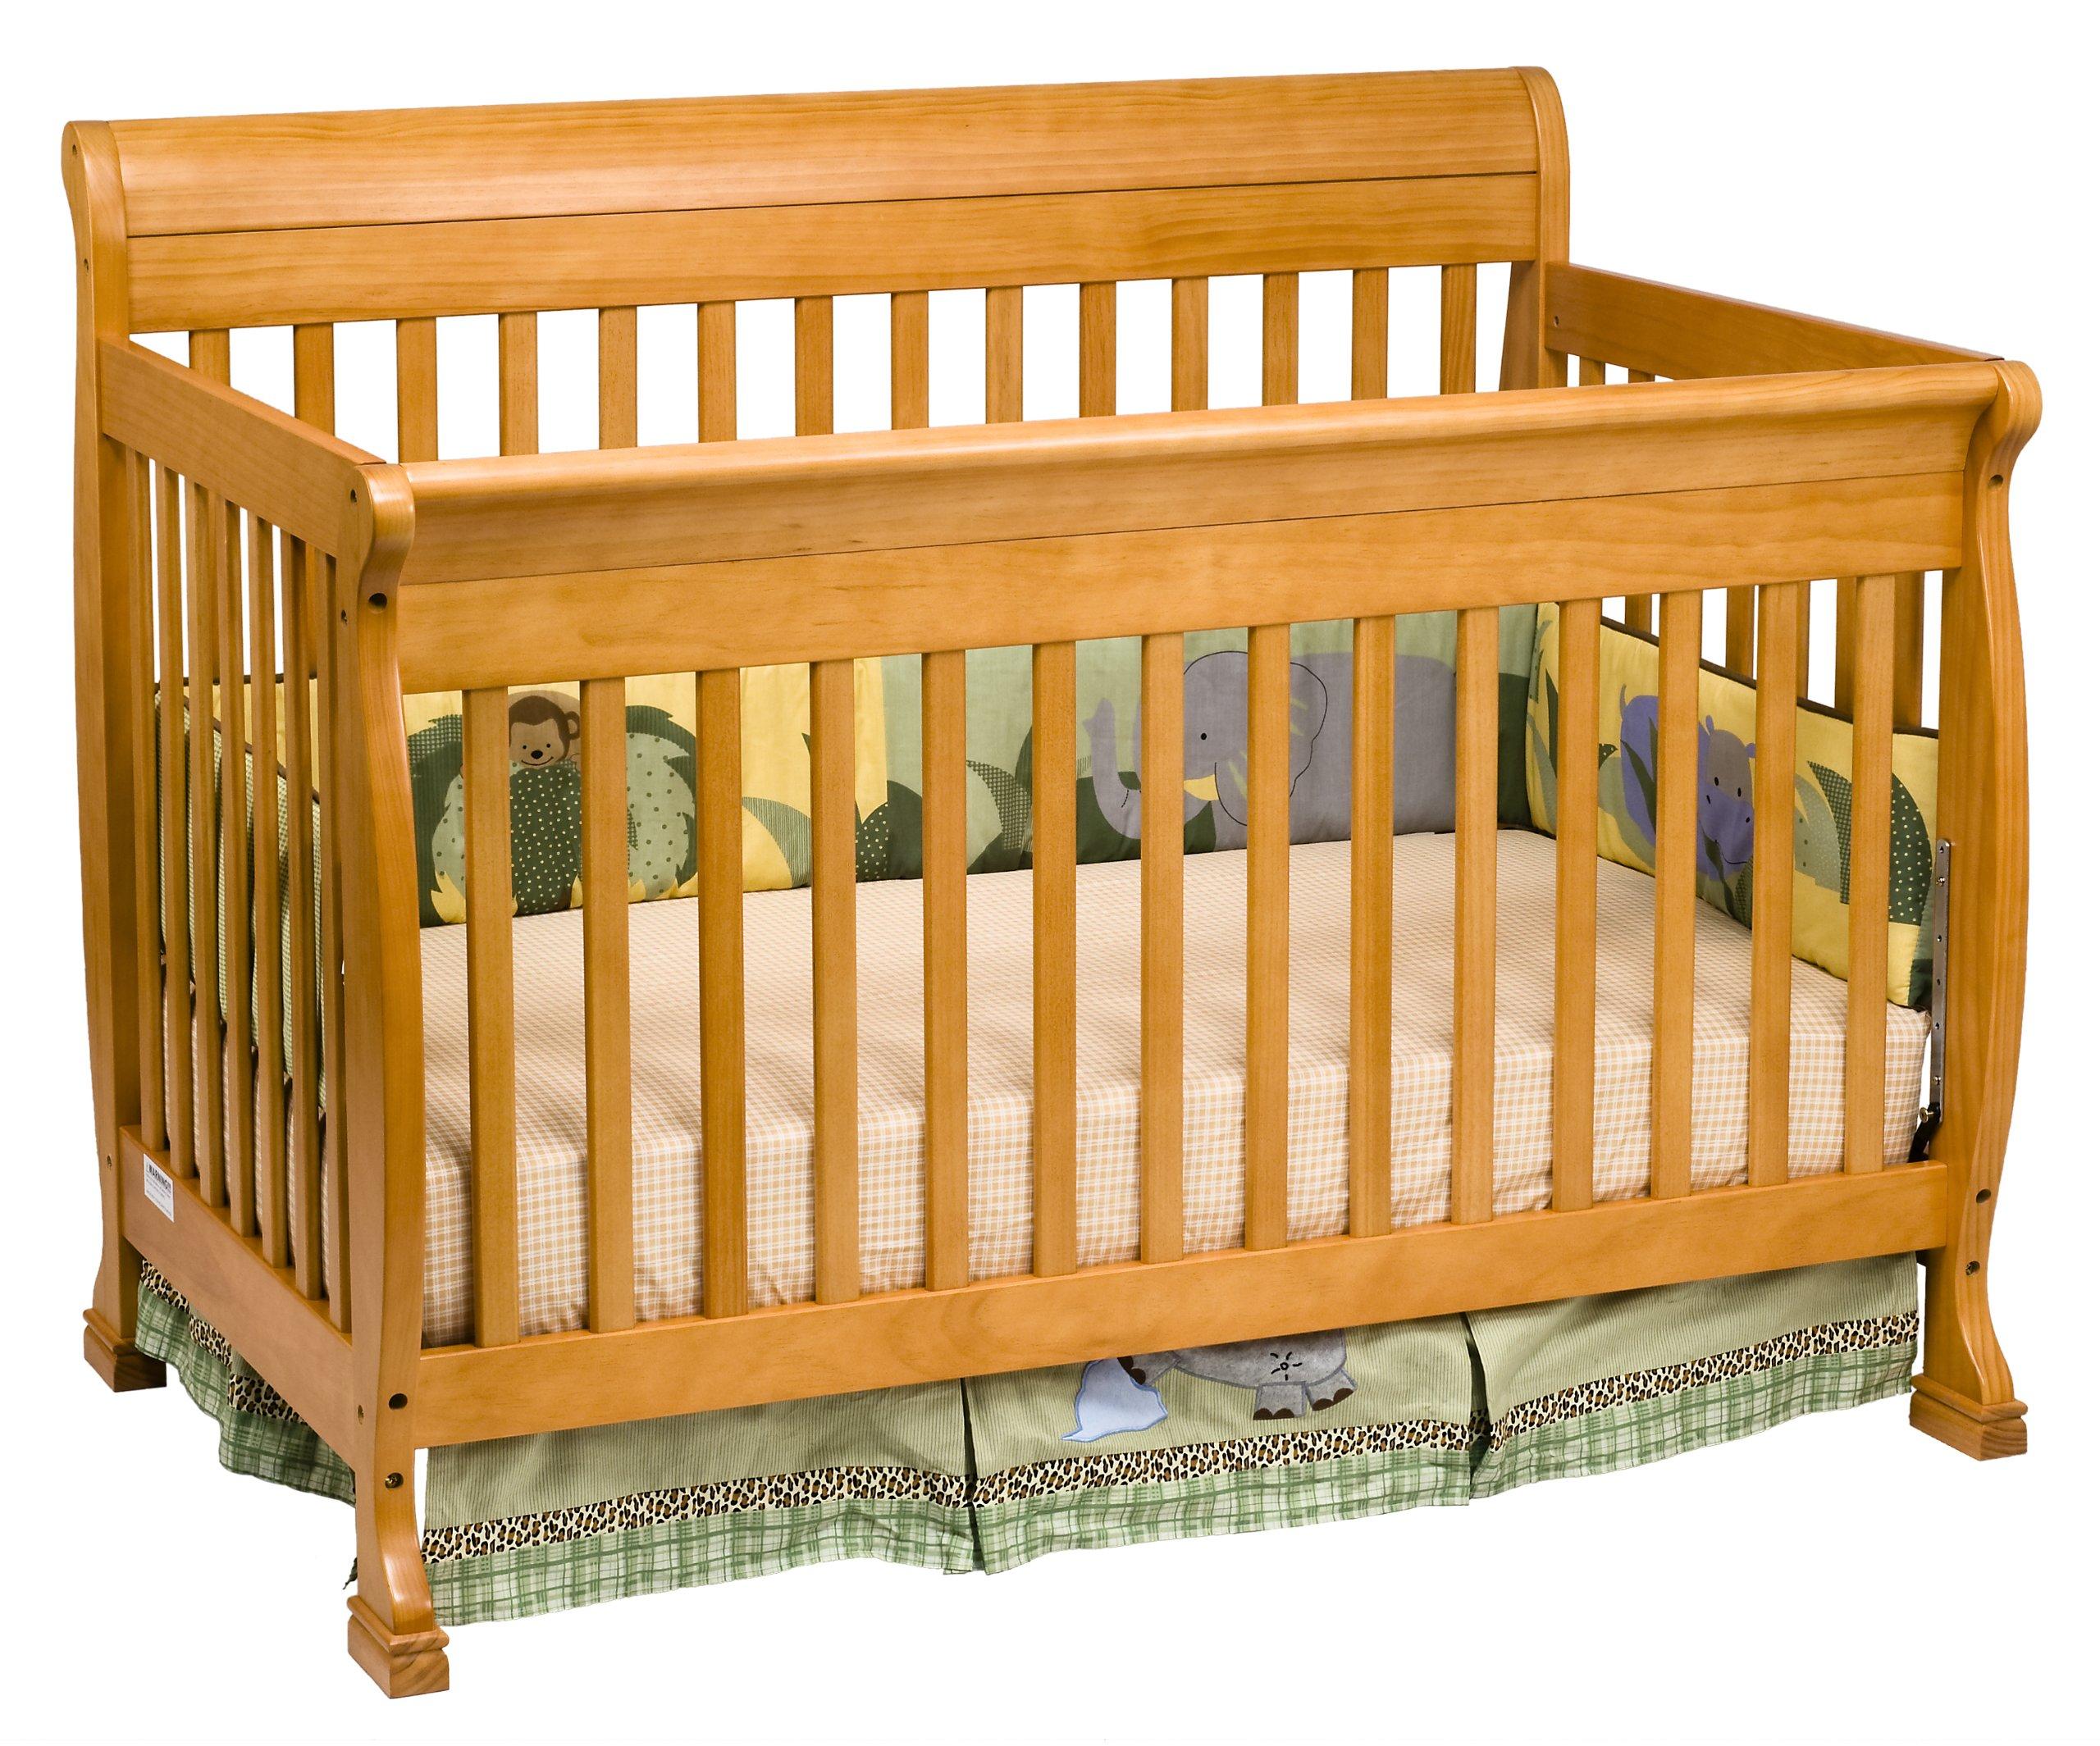 DaVinci Kalani 4-In-1 Convertible Crib, Honey Oak by DaVinci (Image #2)